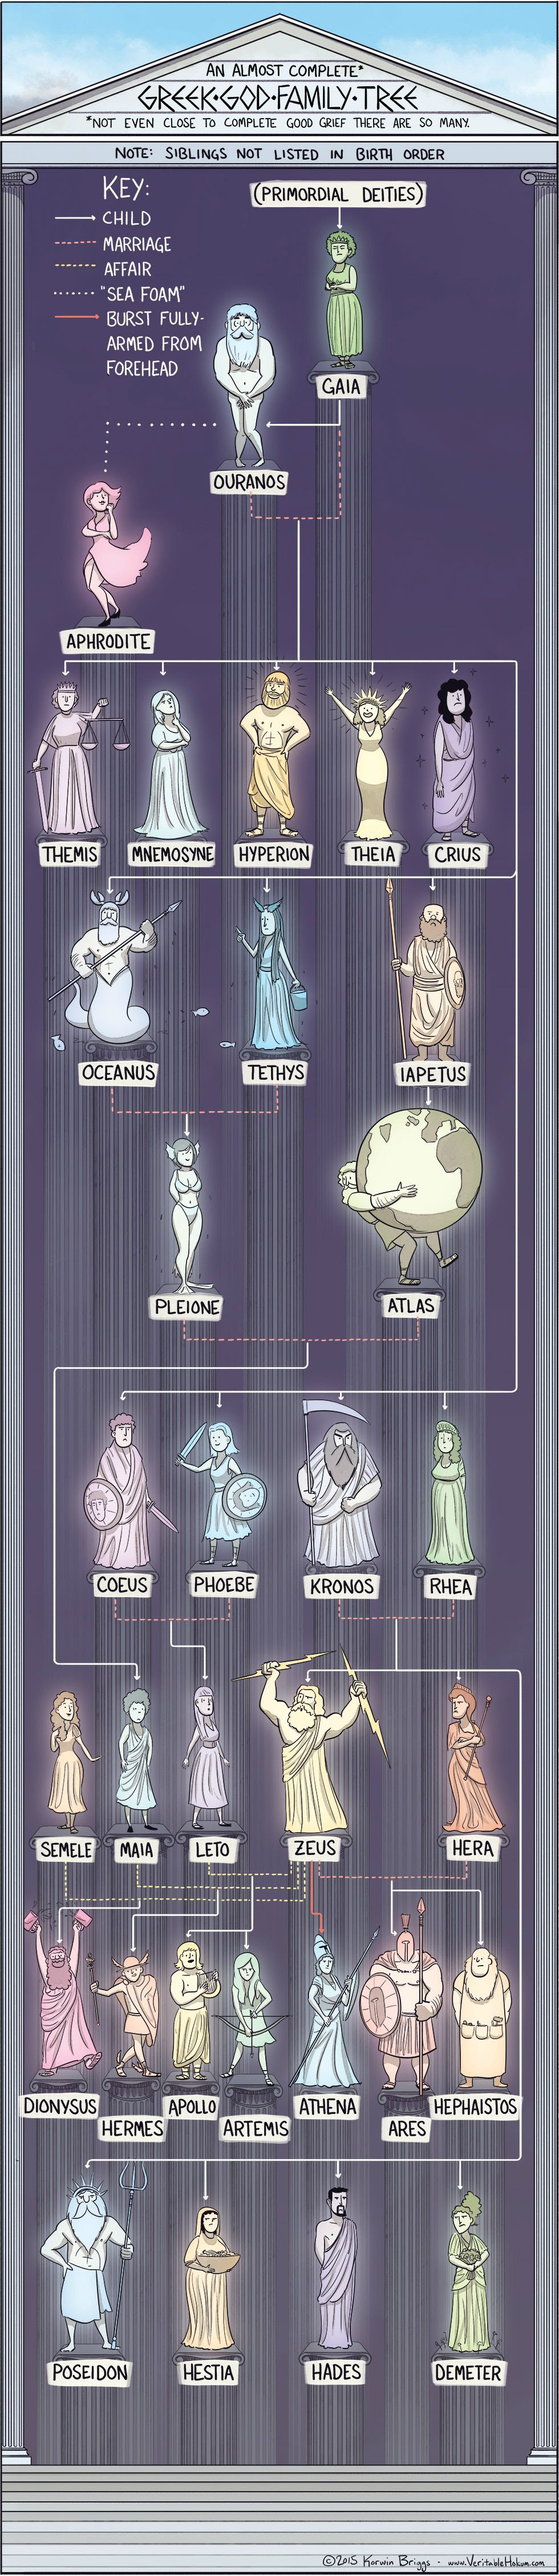 Greek God Family Tree